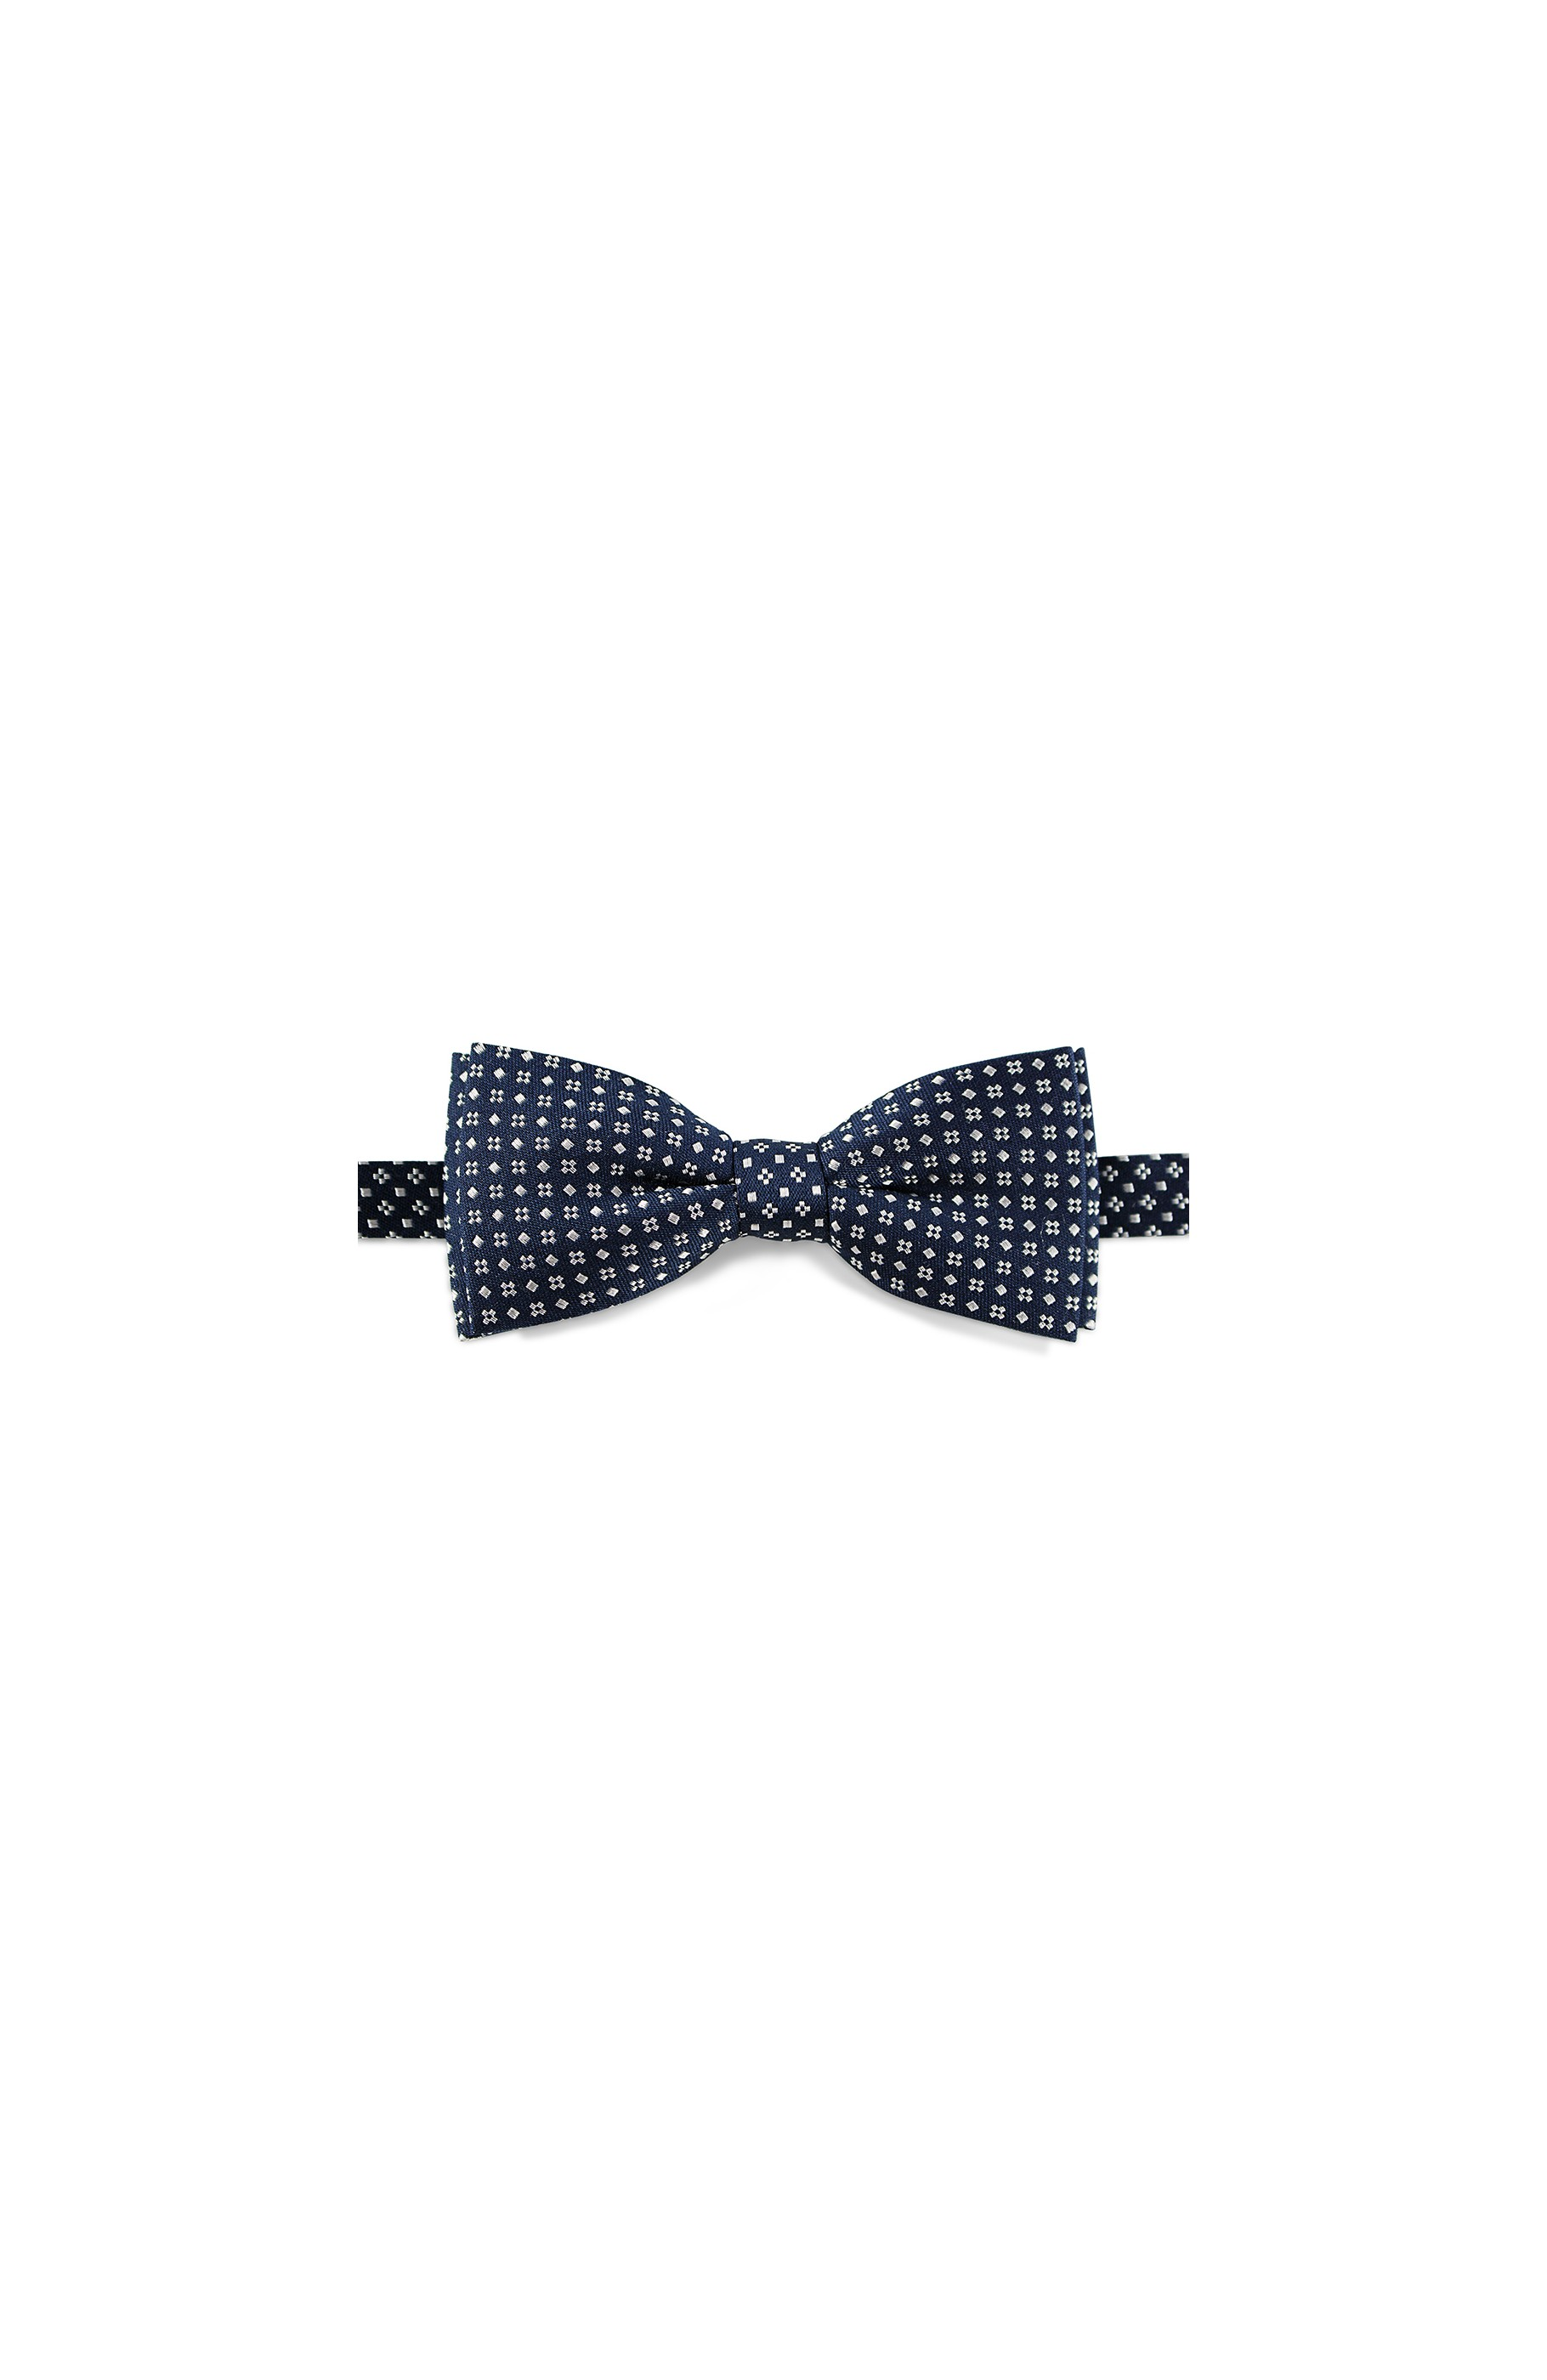 Majesté Couture Paris: Navy silk bow tie with white dots | Accessories -  Hiphunters Shop